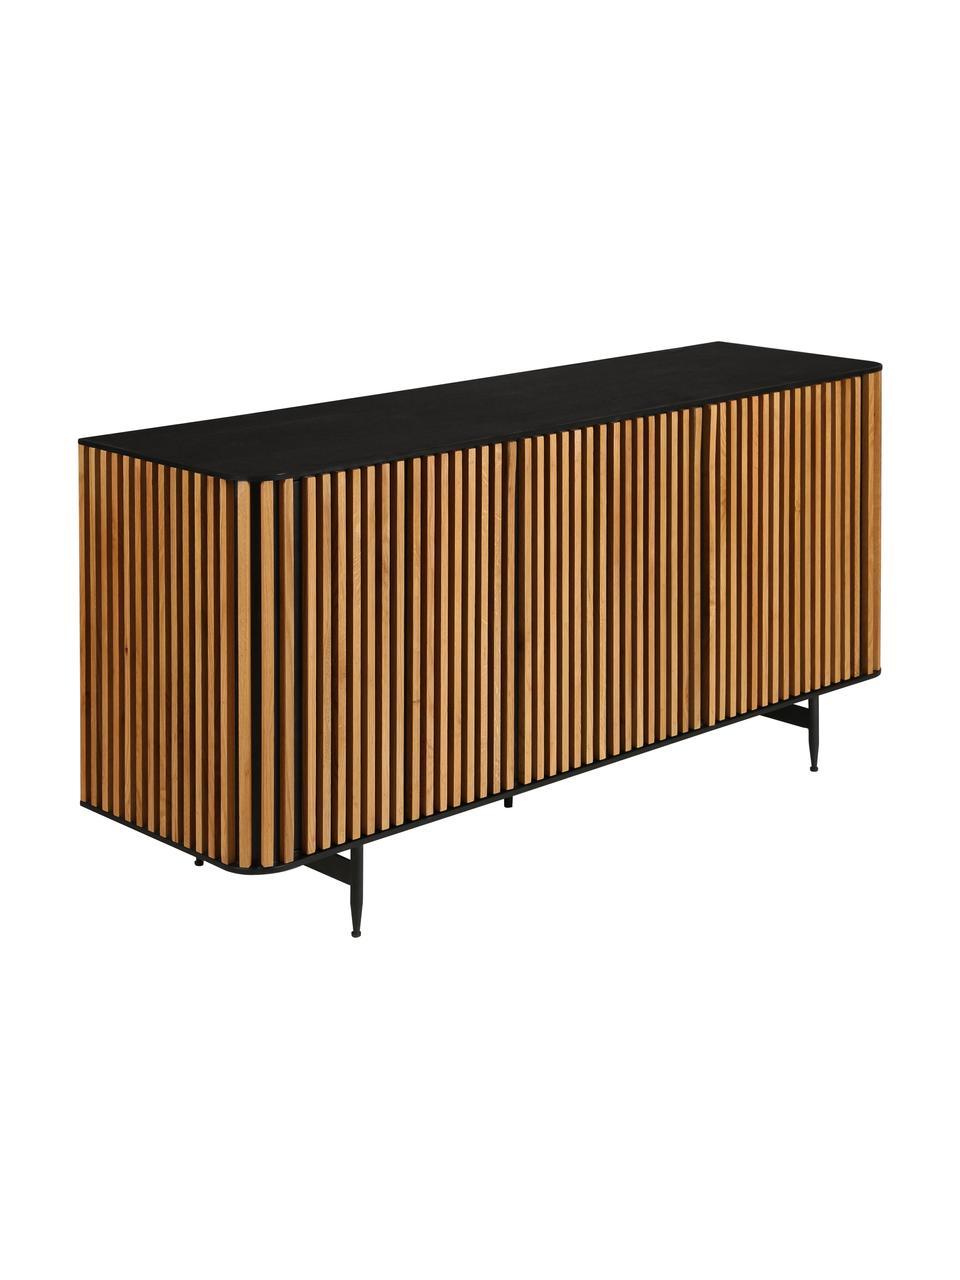 Enfilade design plaquée chêne Linea, Noir, bois de chêne